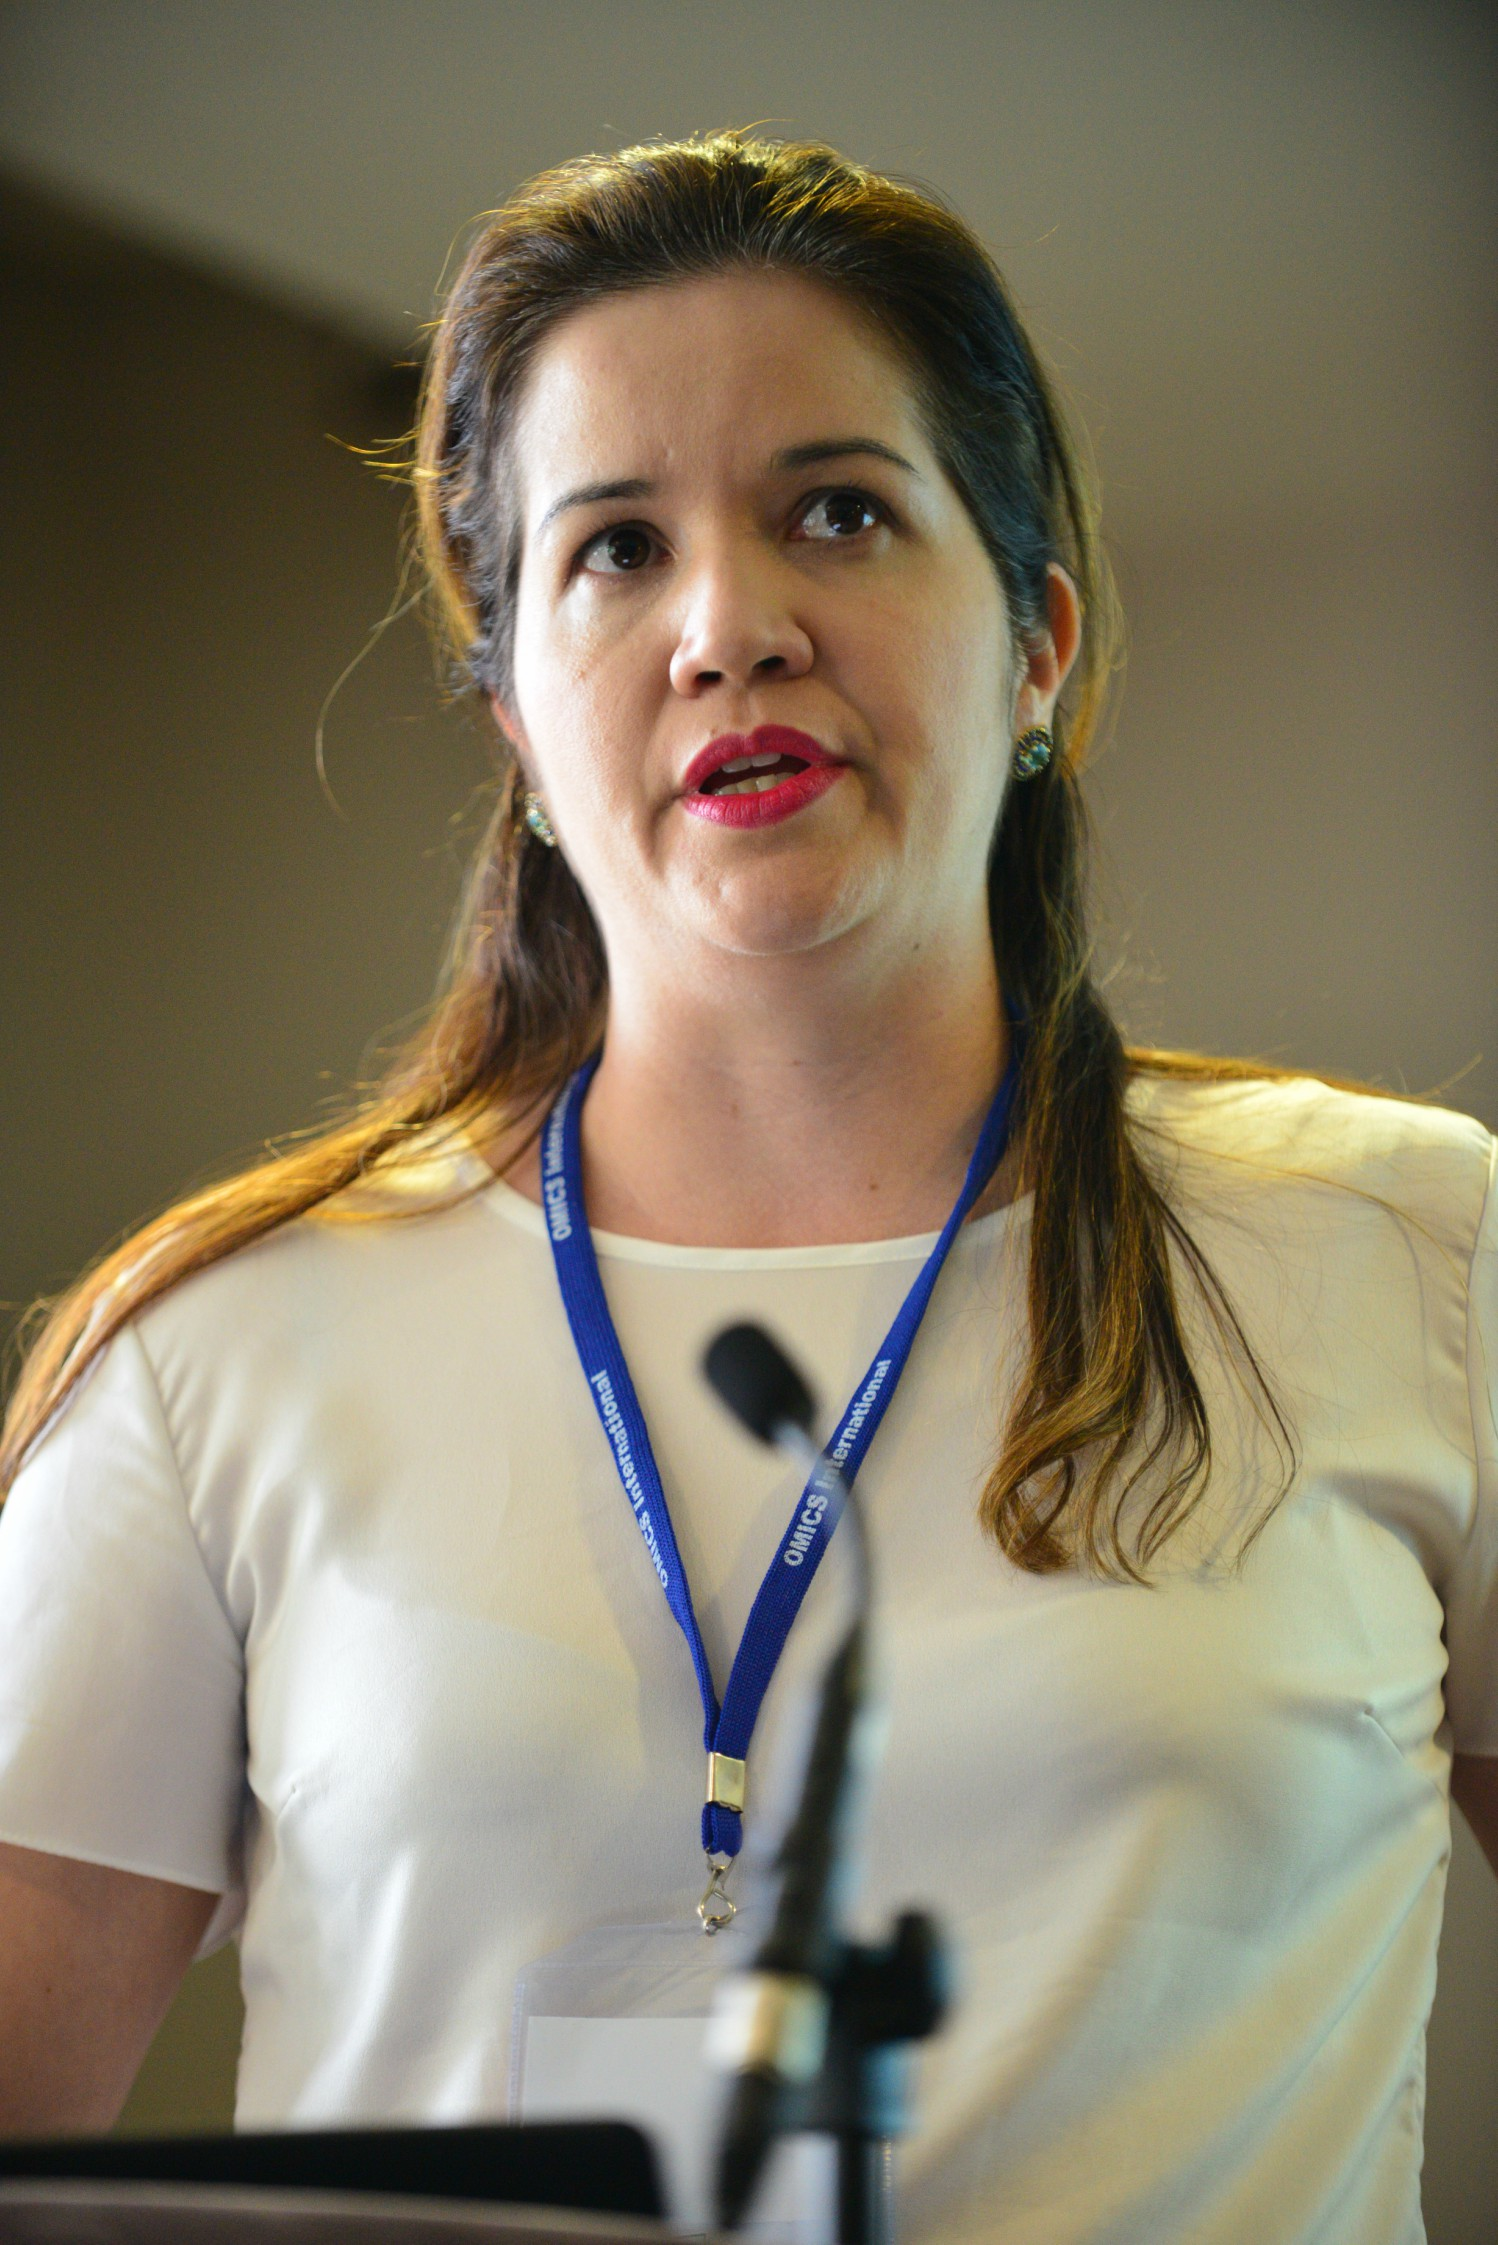 Ana Paula Pereira Santana Lemes-Canuto    OMICS International